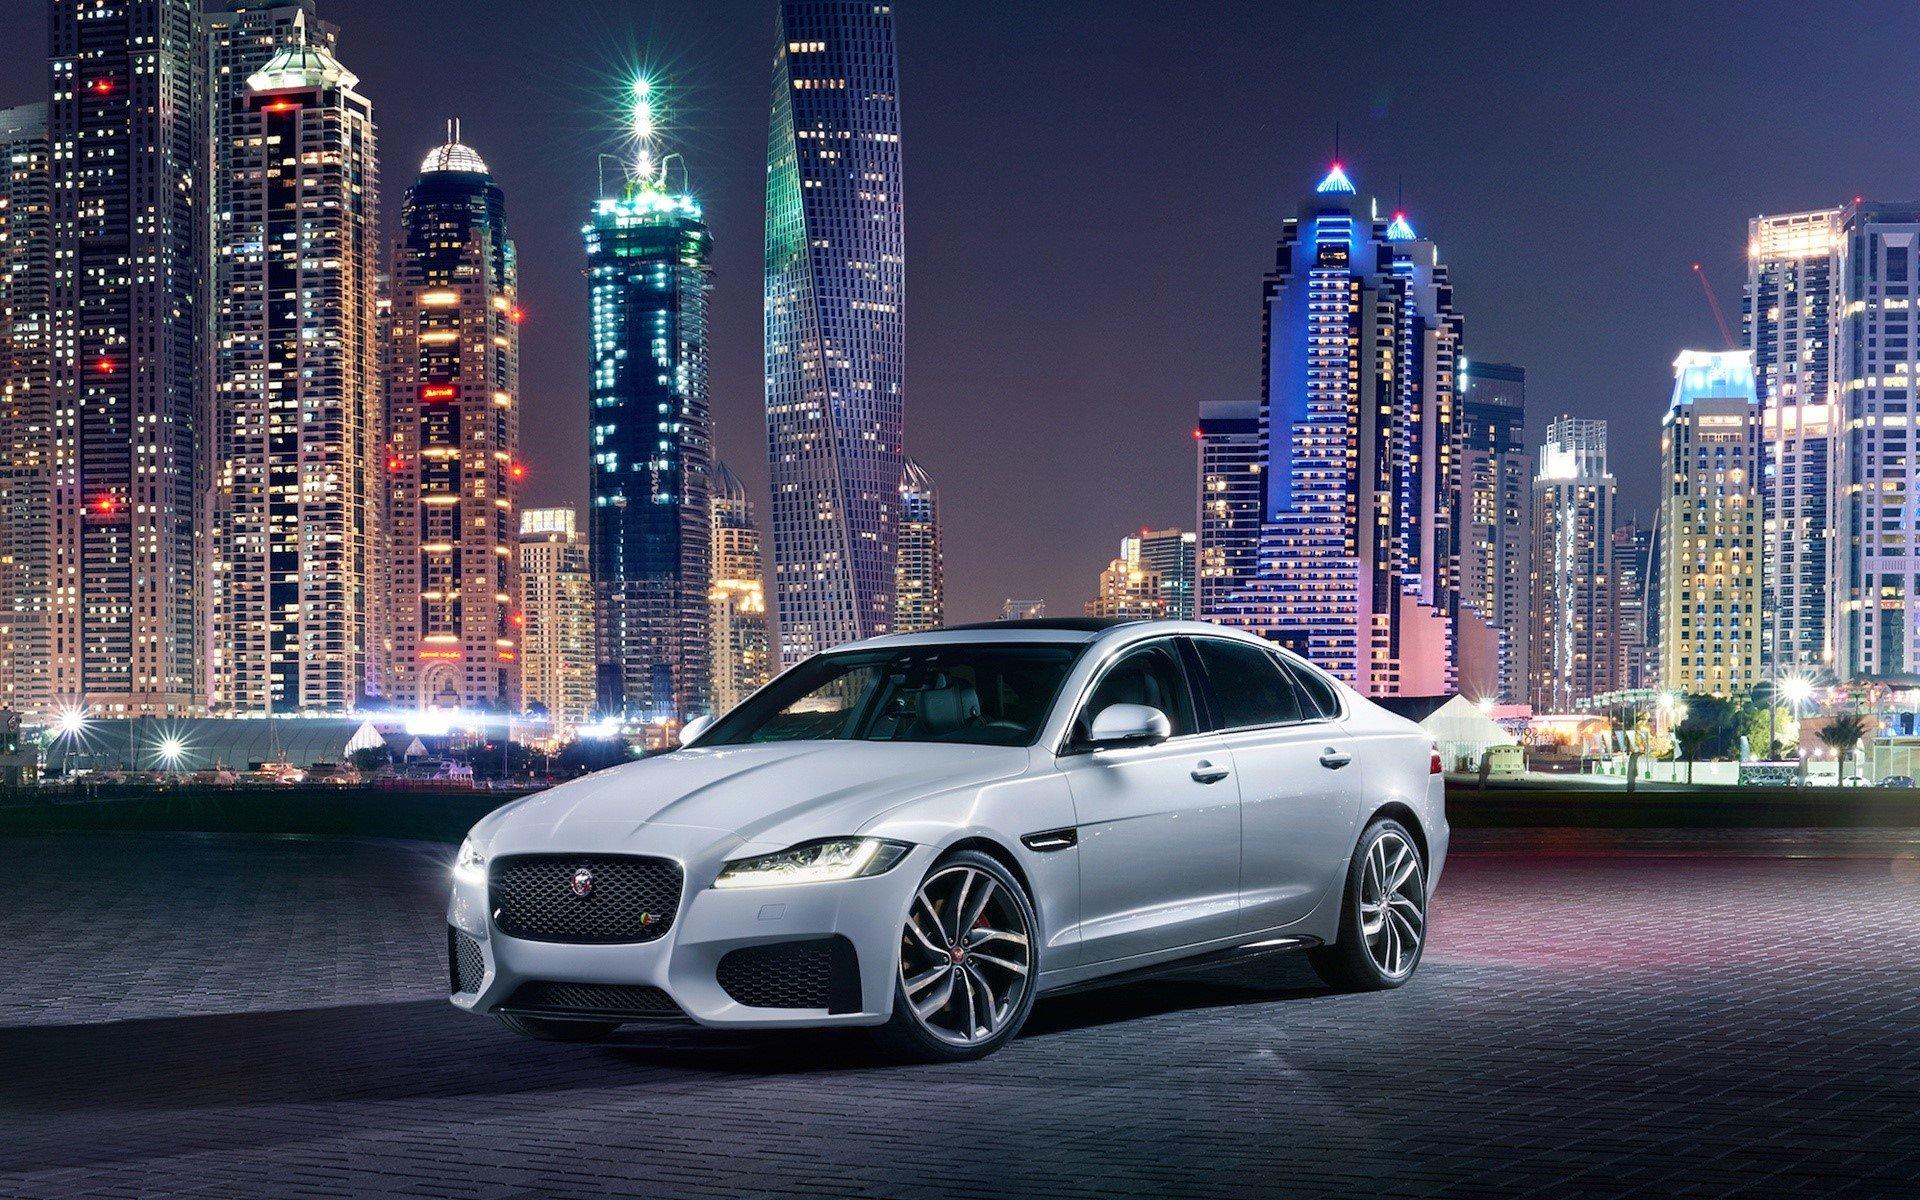 Fondos de pantalla Jaguar XF